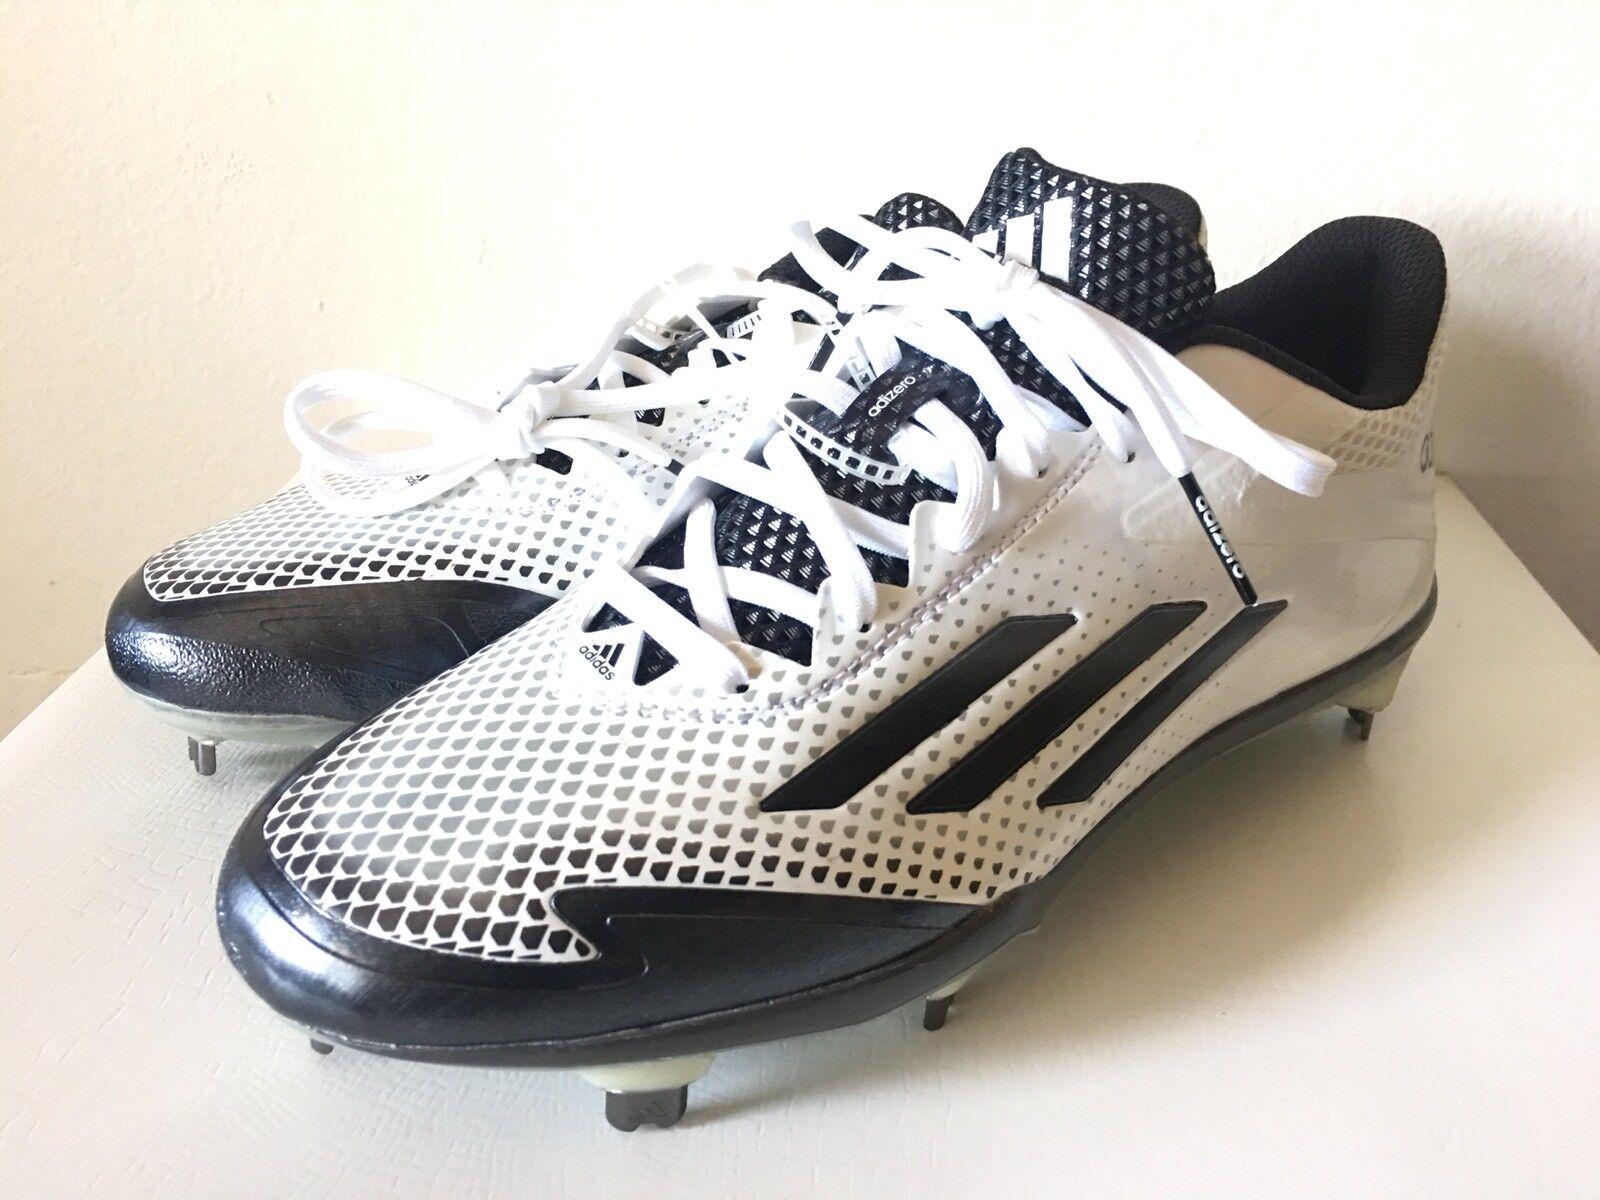 ADIDAS Adizero Afterburner 2.0 Baseball Metal Cleats White S85704 New Men Size 8